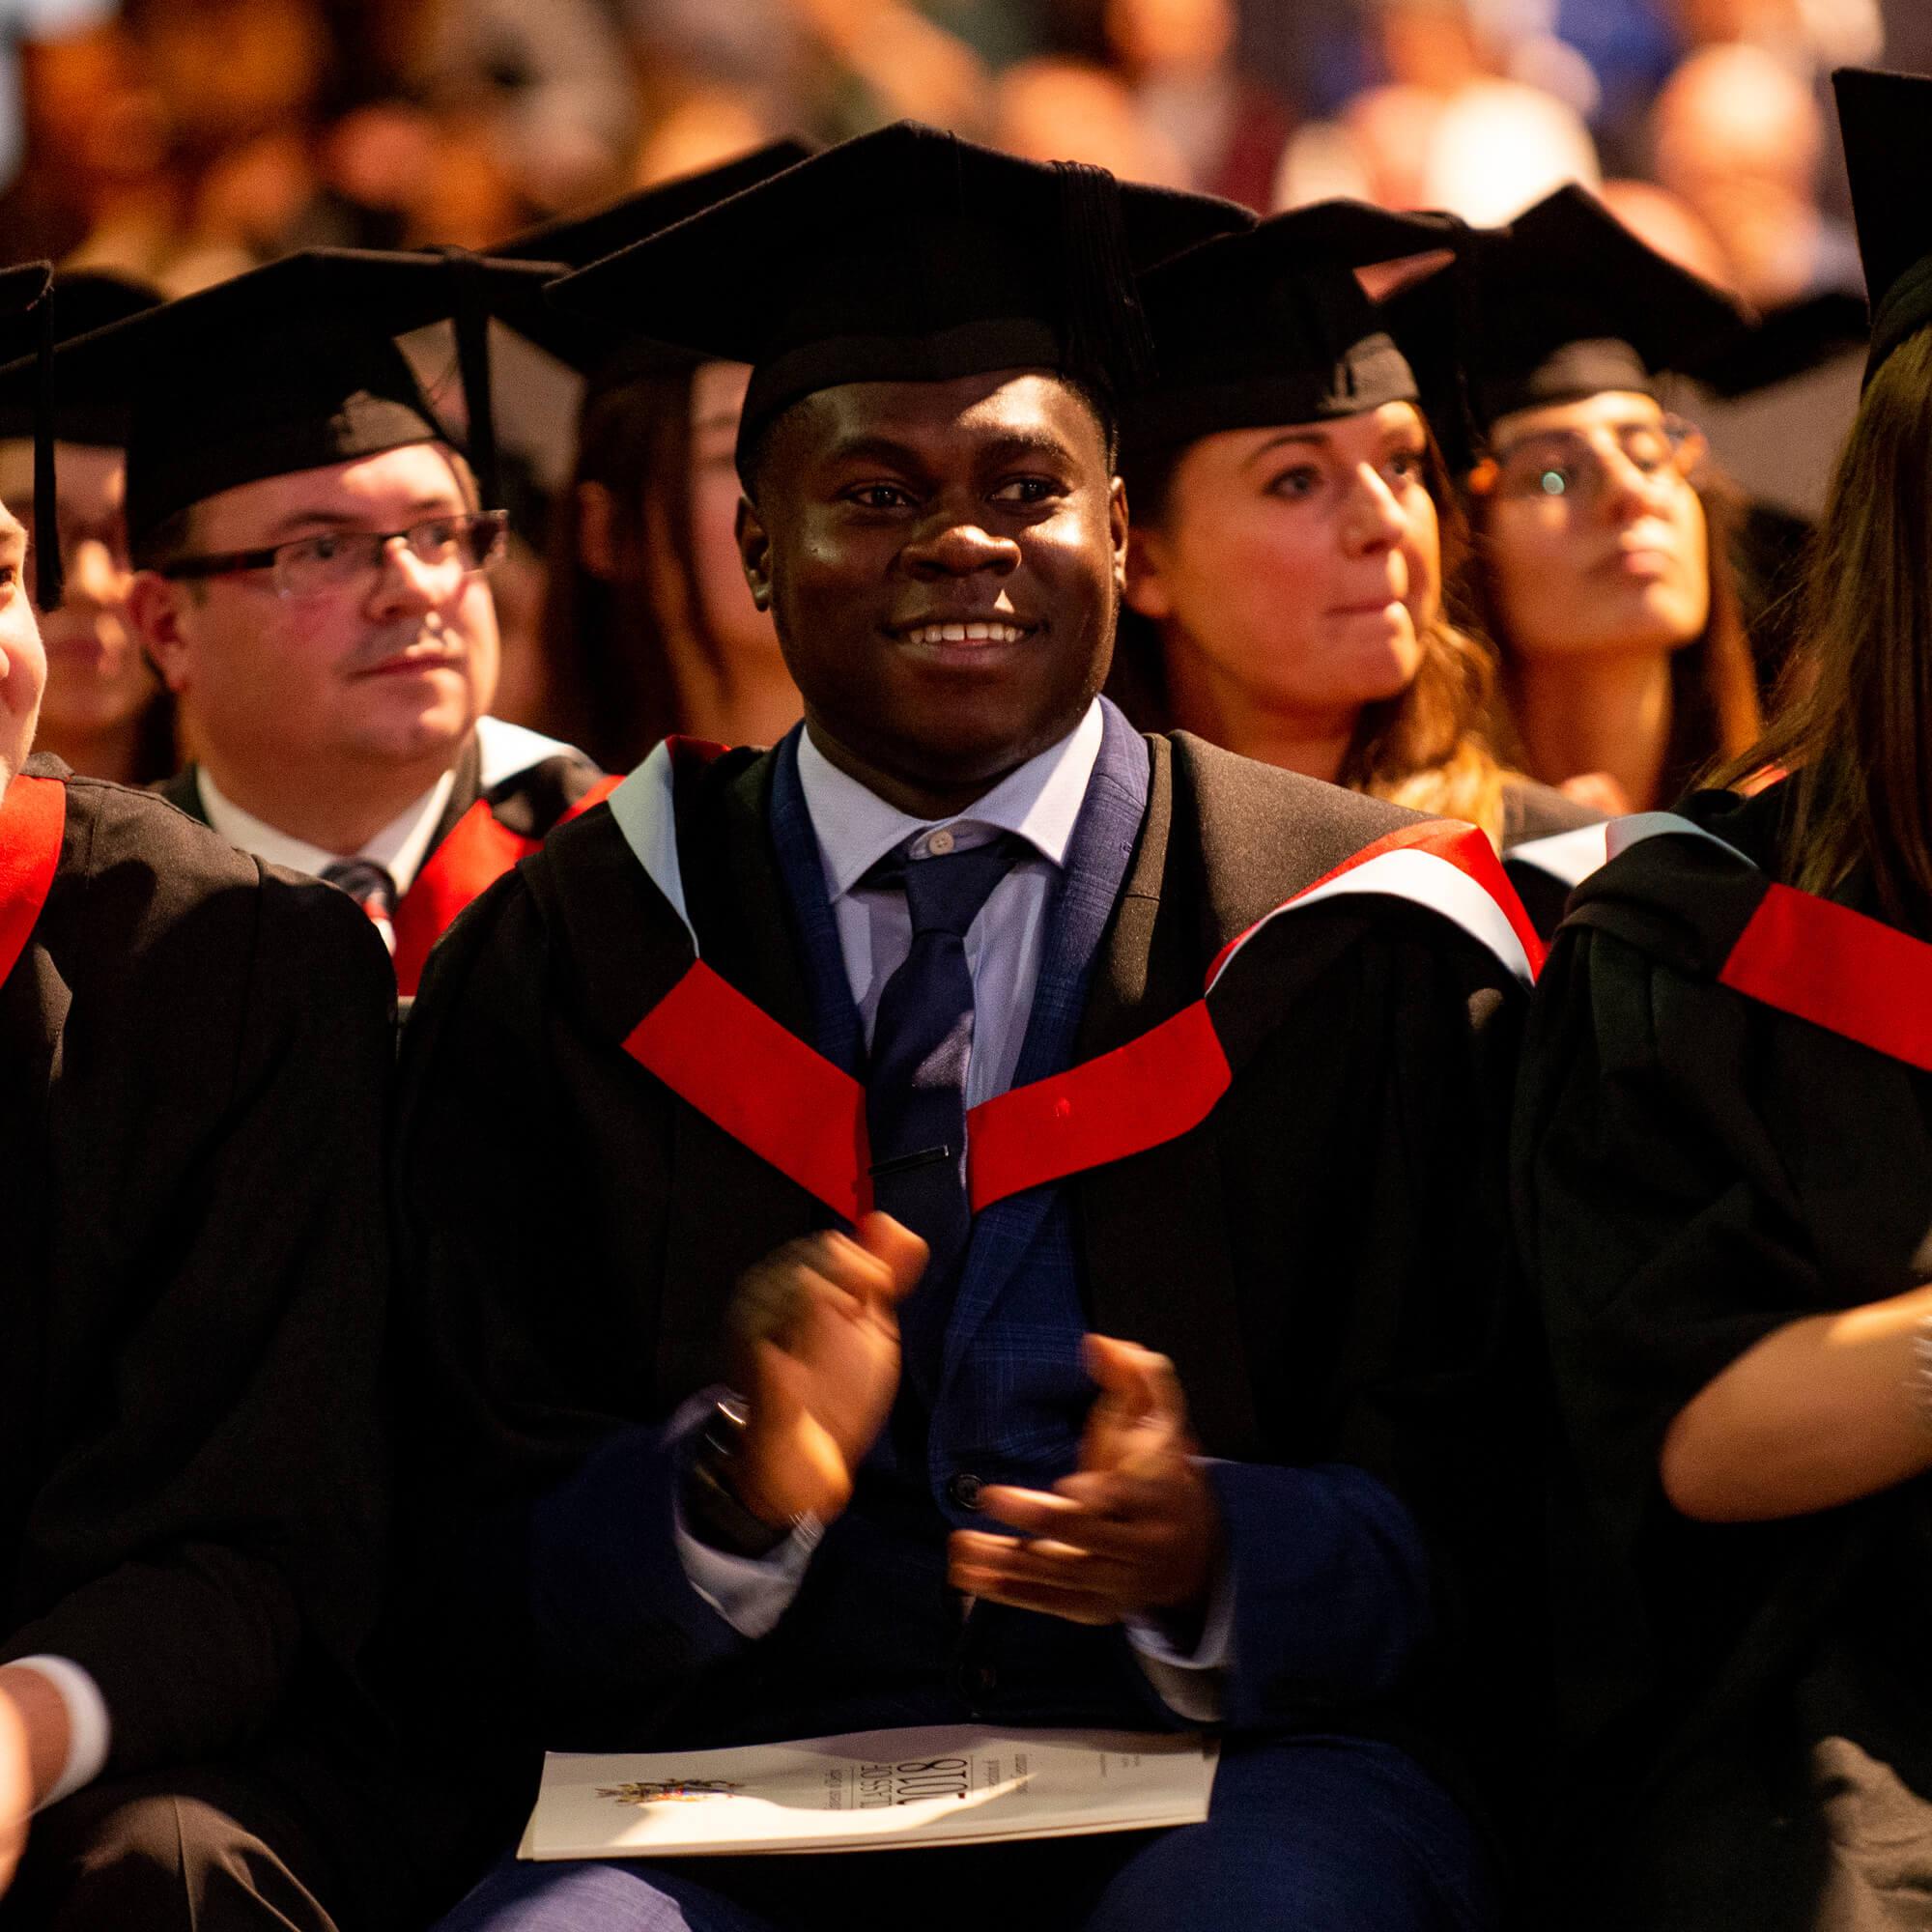 students applauding at graduation